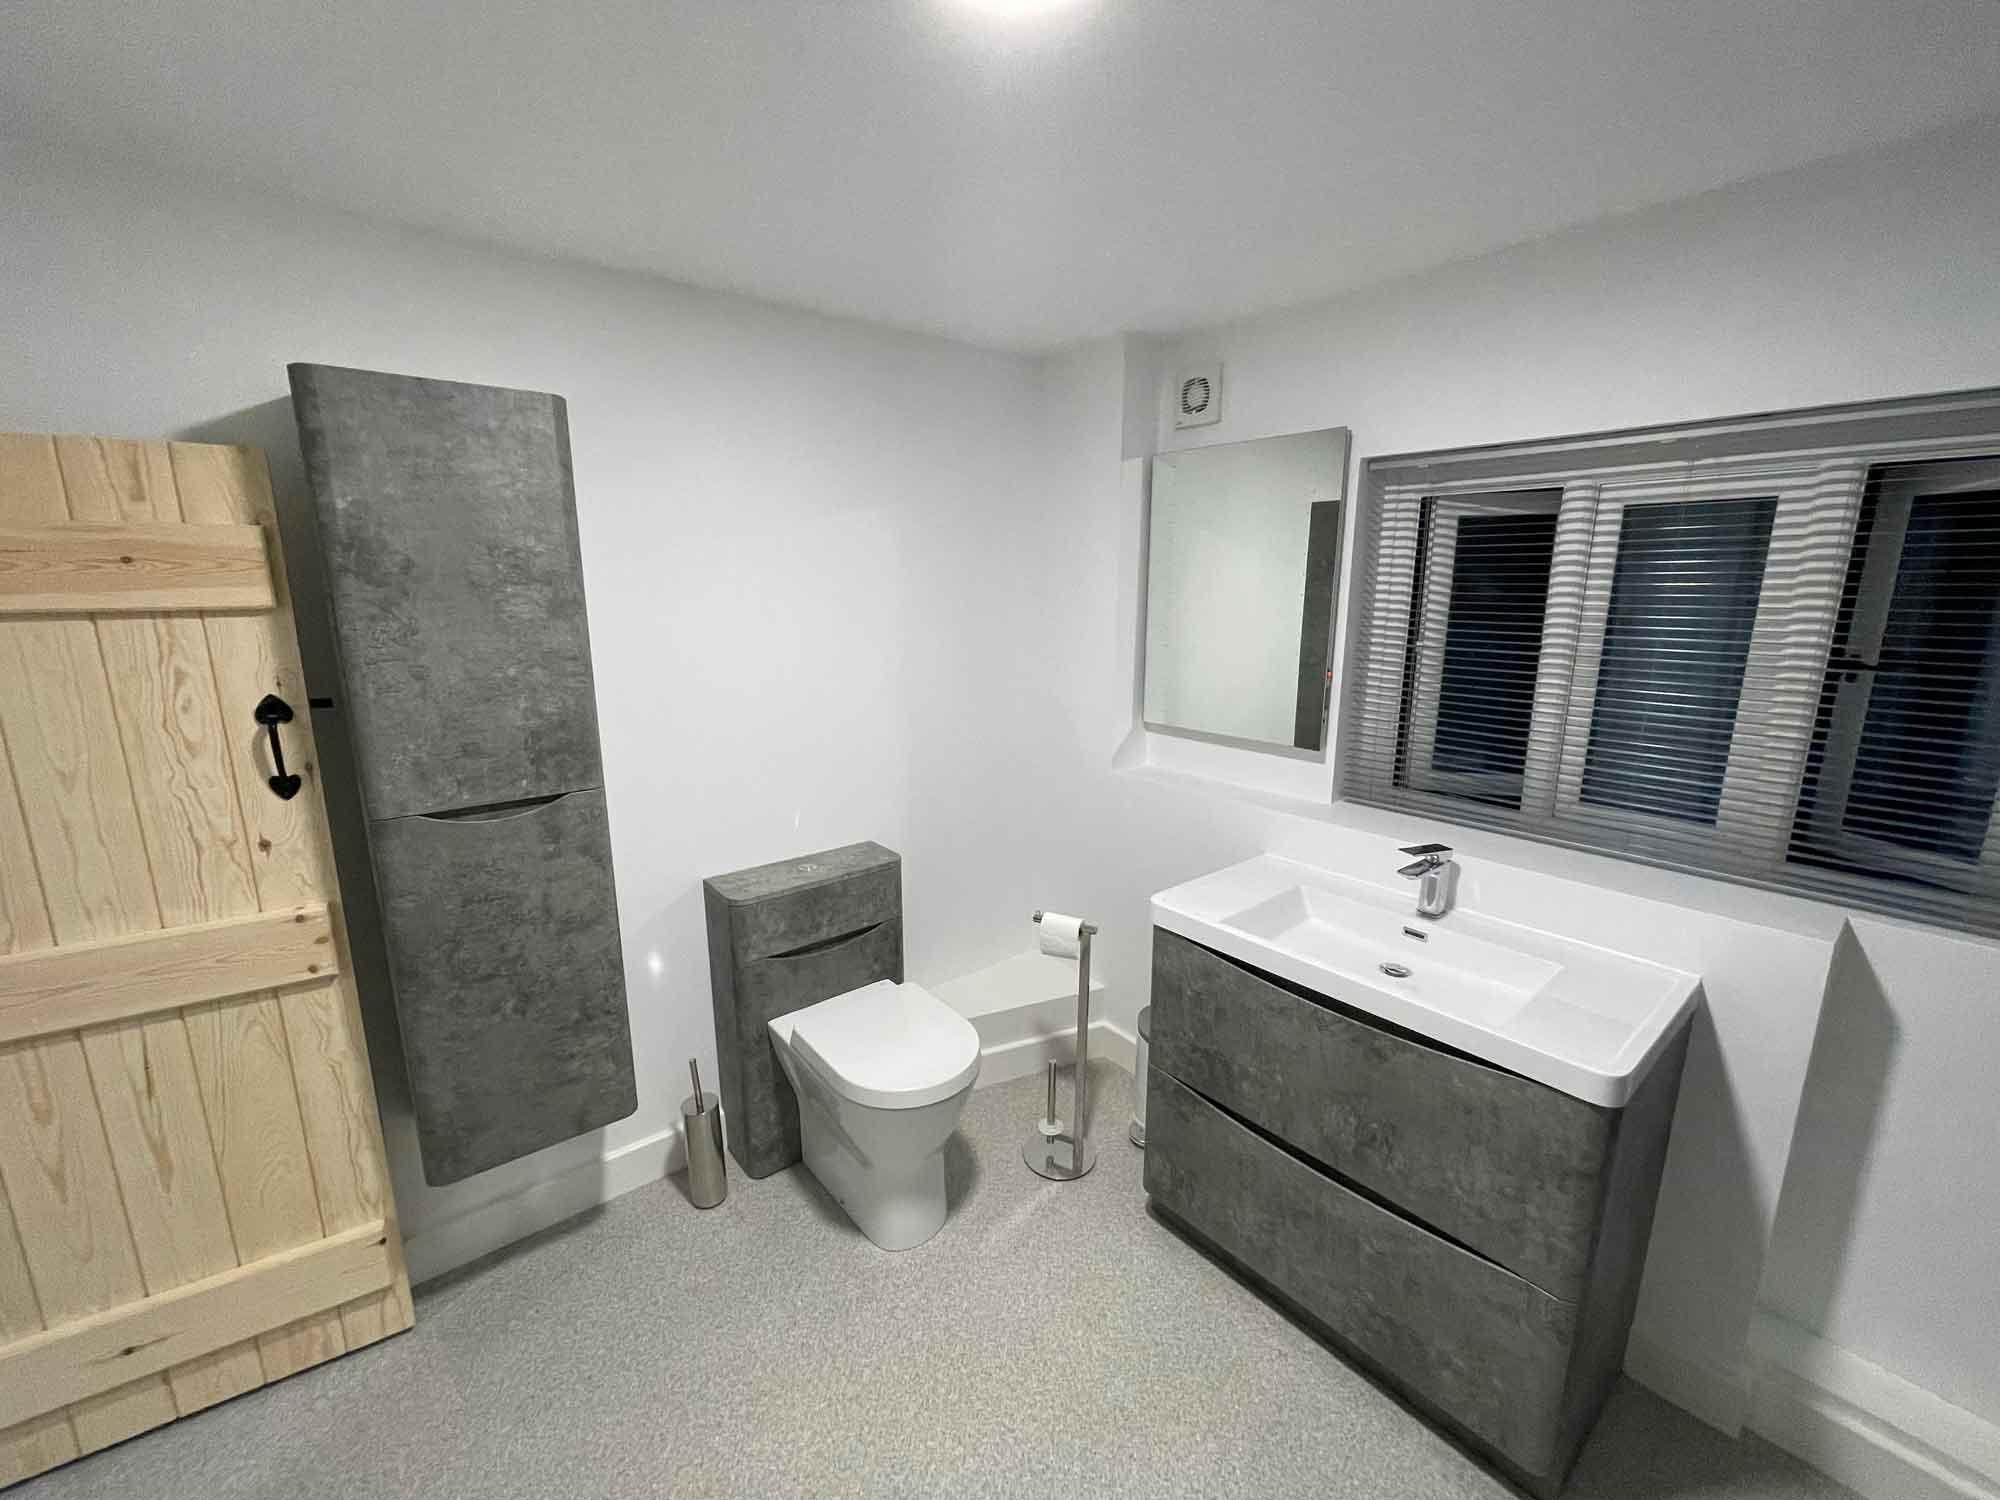 Sparta Mech plumbing - bathroom